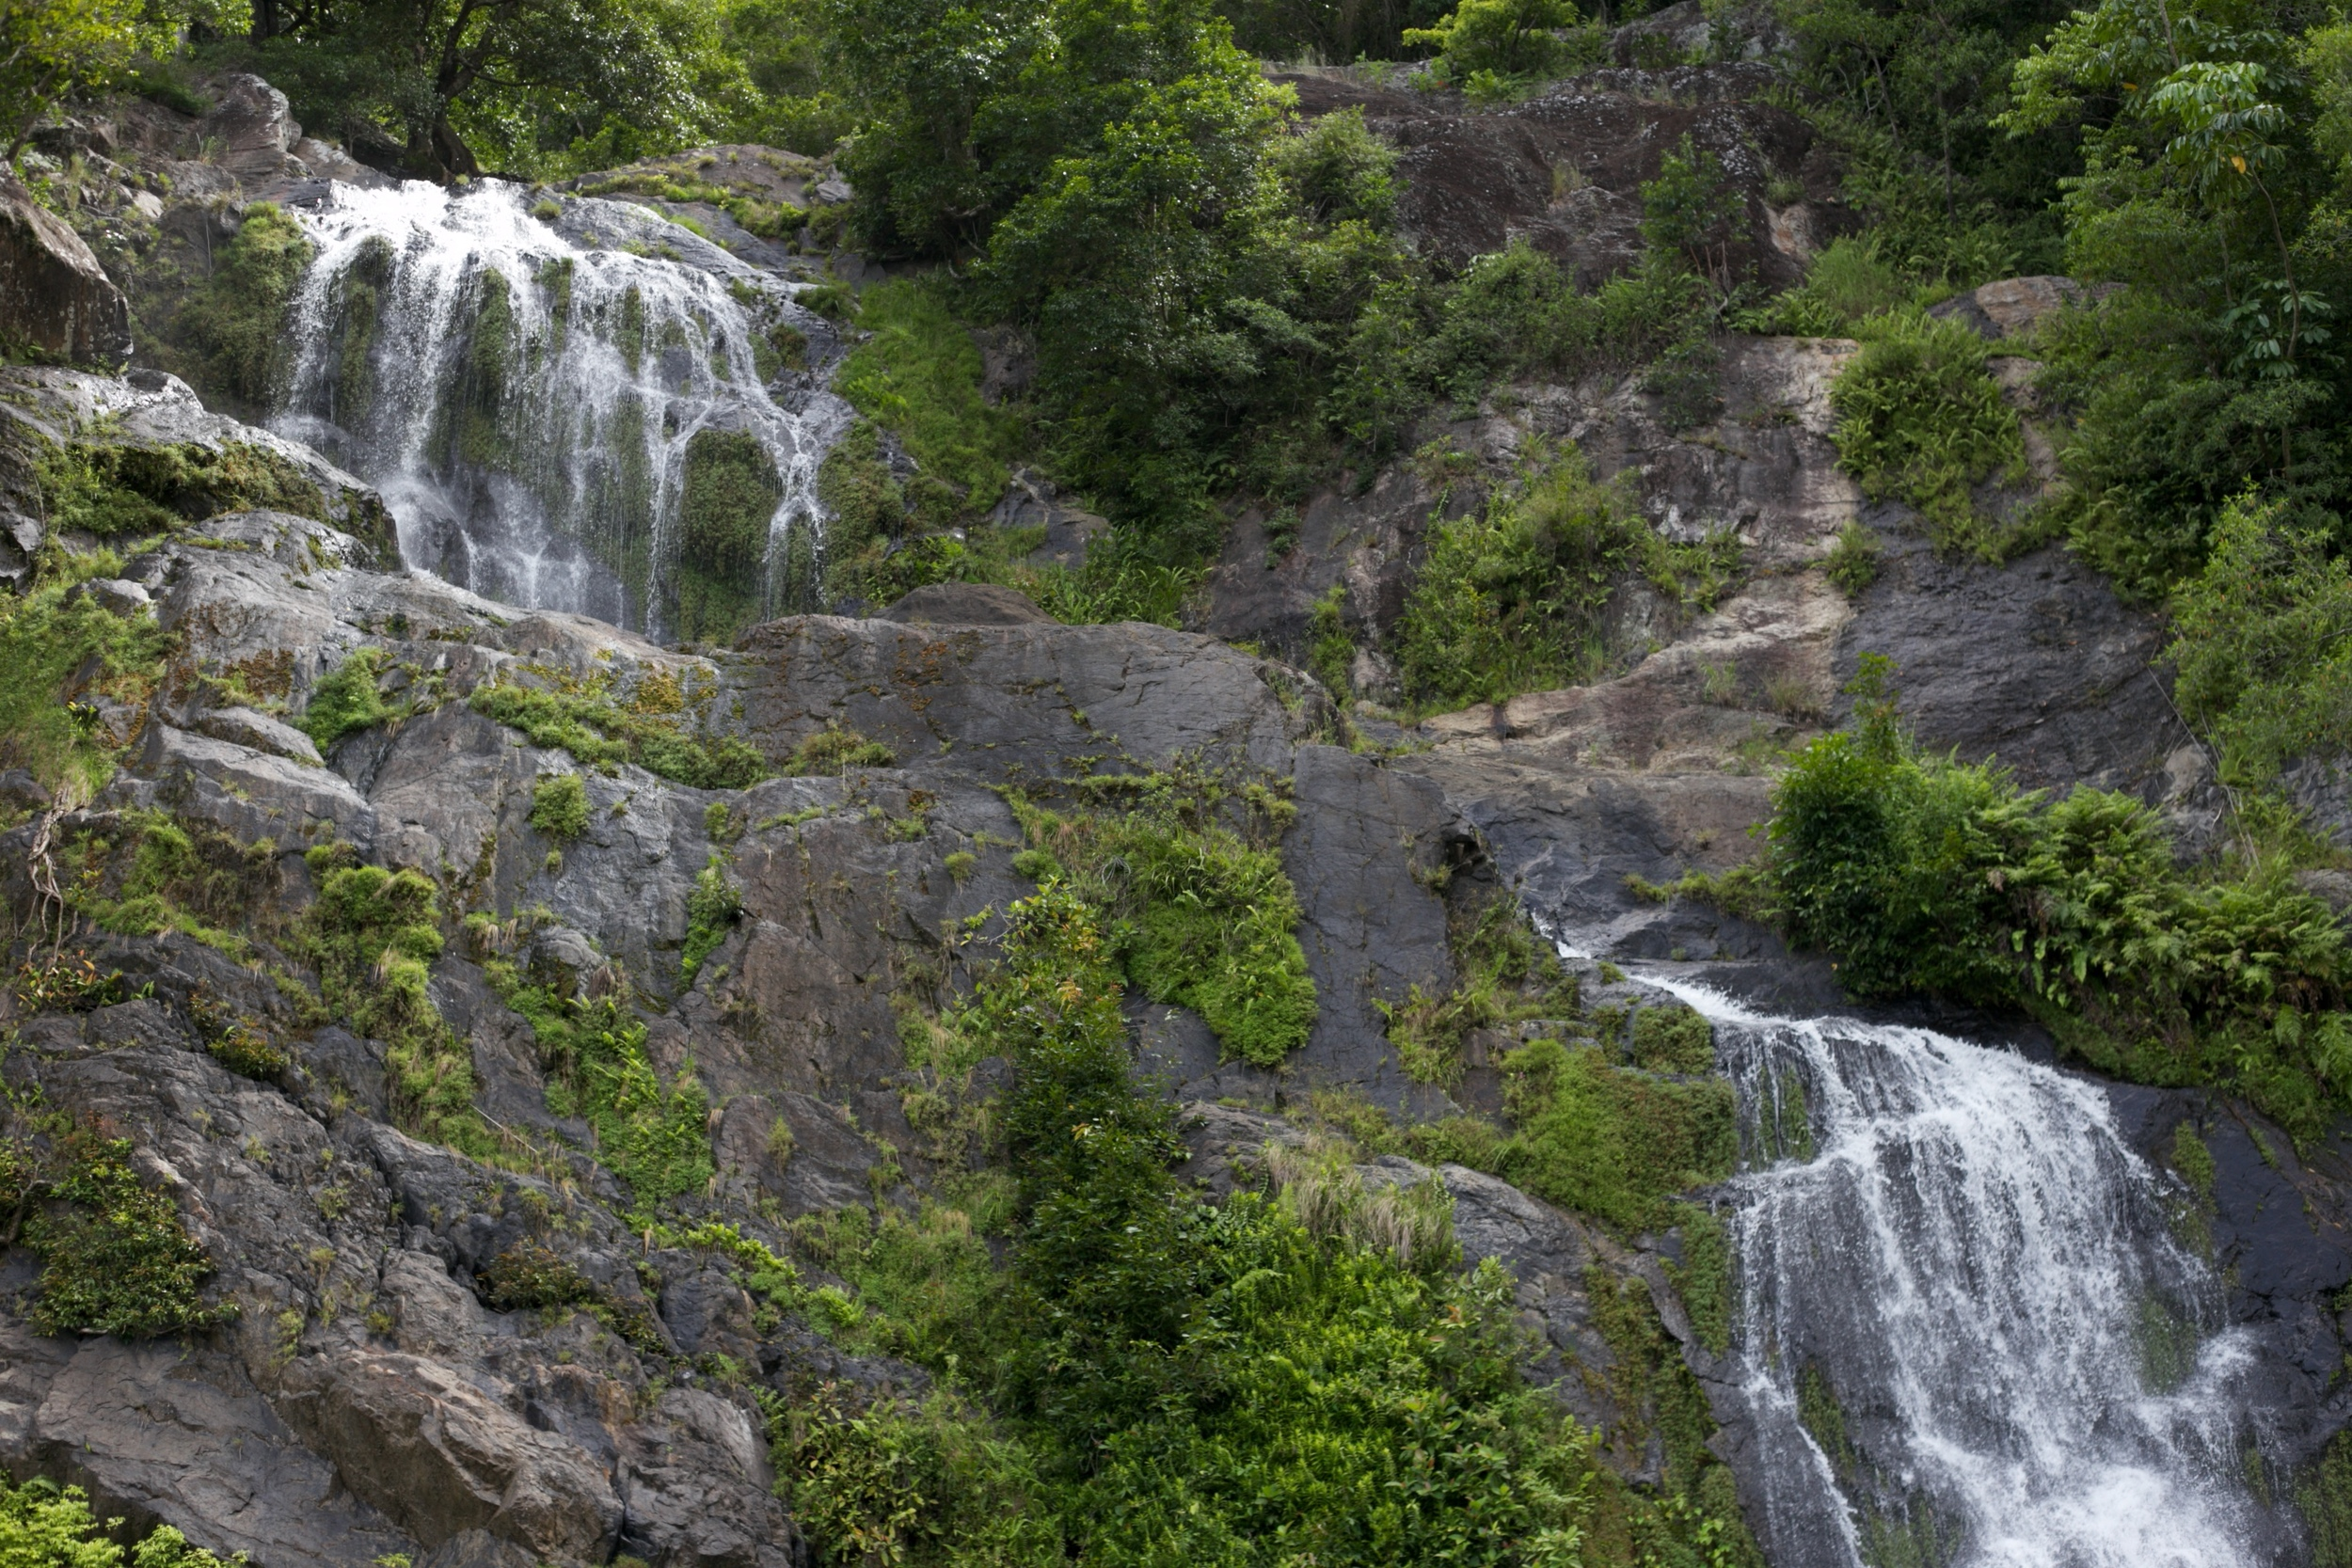 Stony Creek waterfall in the Kuranda area.